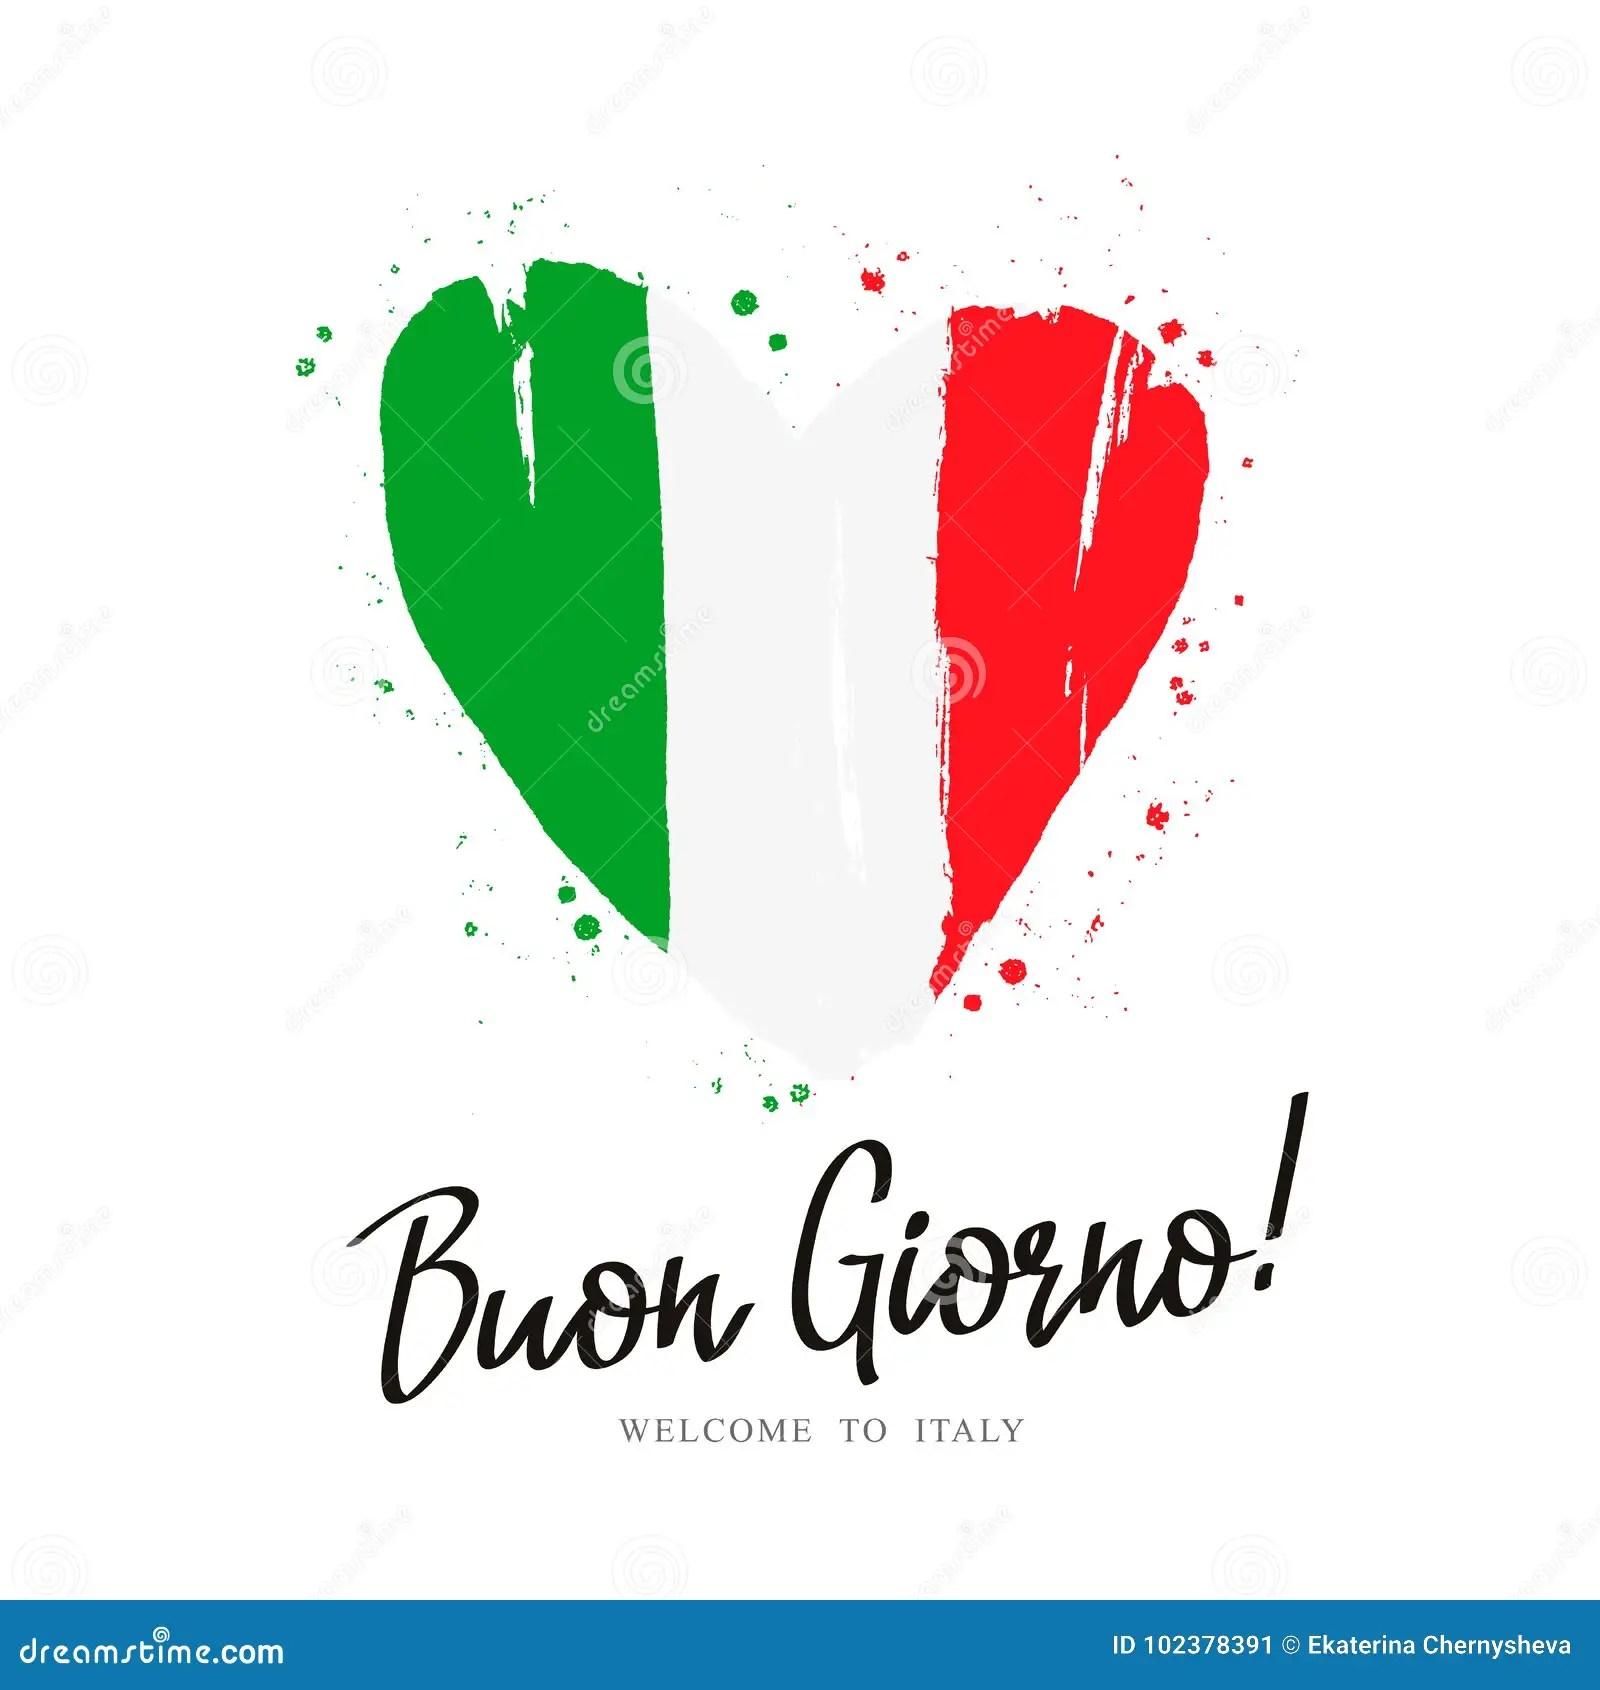 https fr dreamstime com buon giorno drapeau l italie sous forme grand coeur image102378391